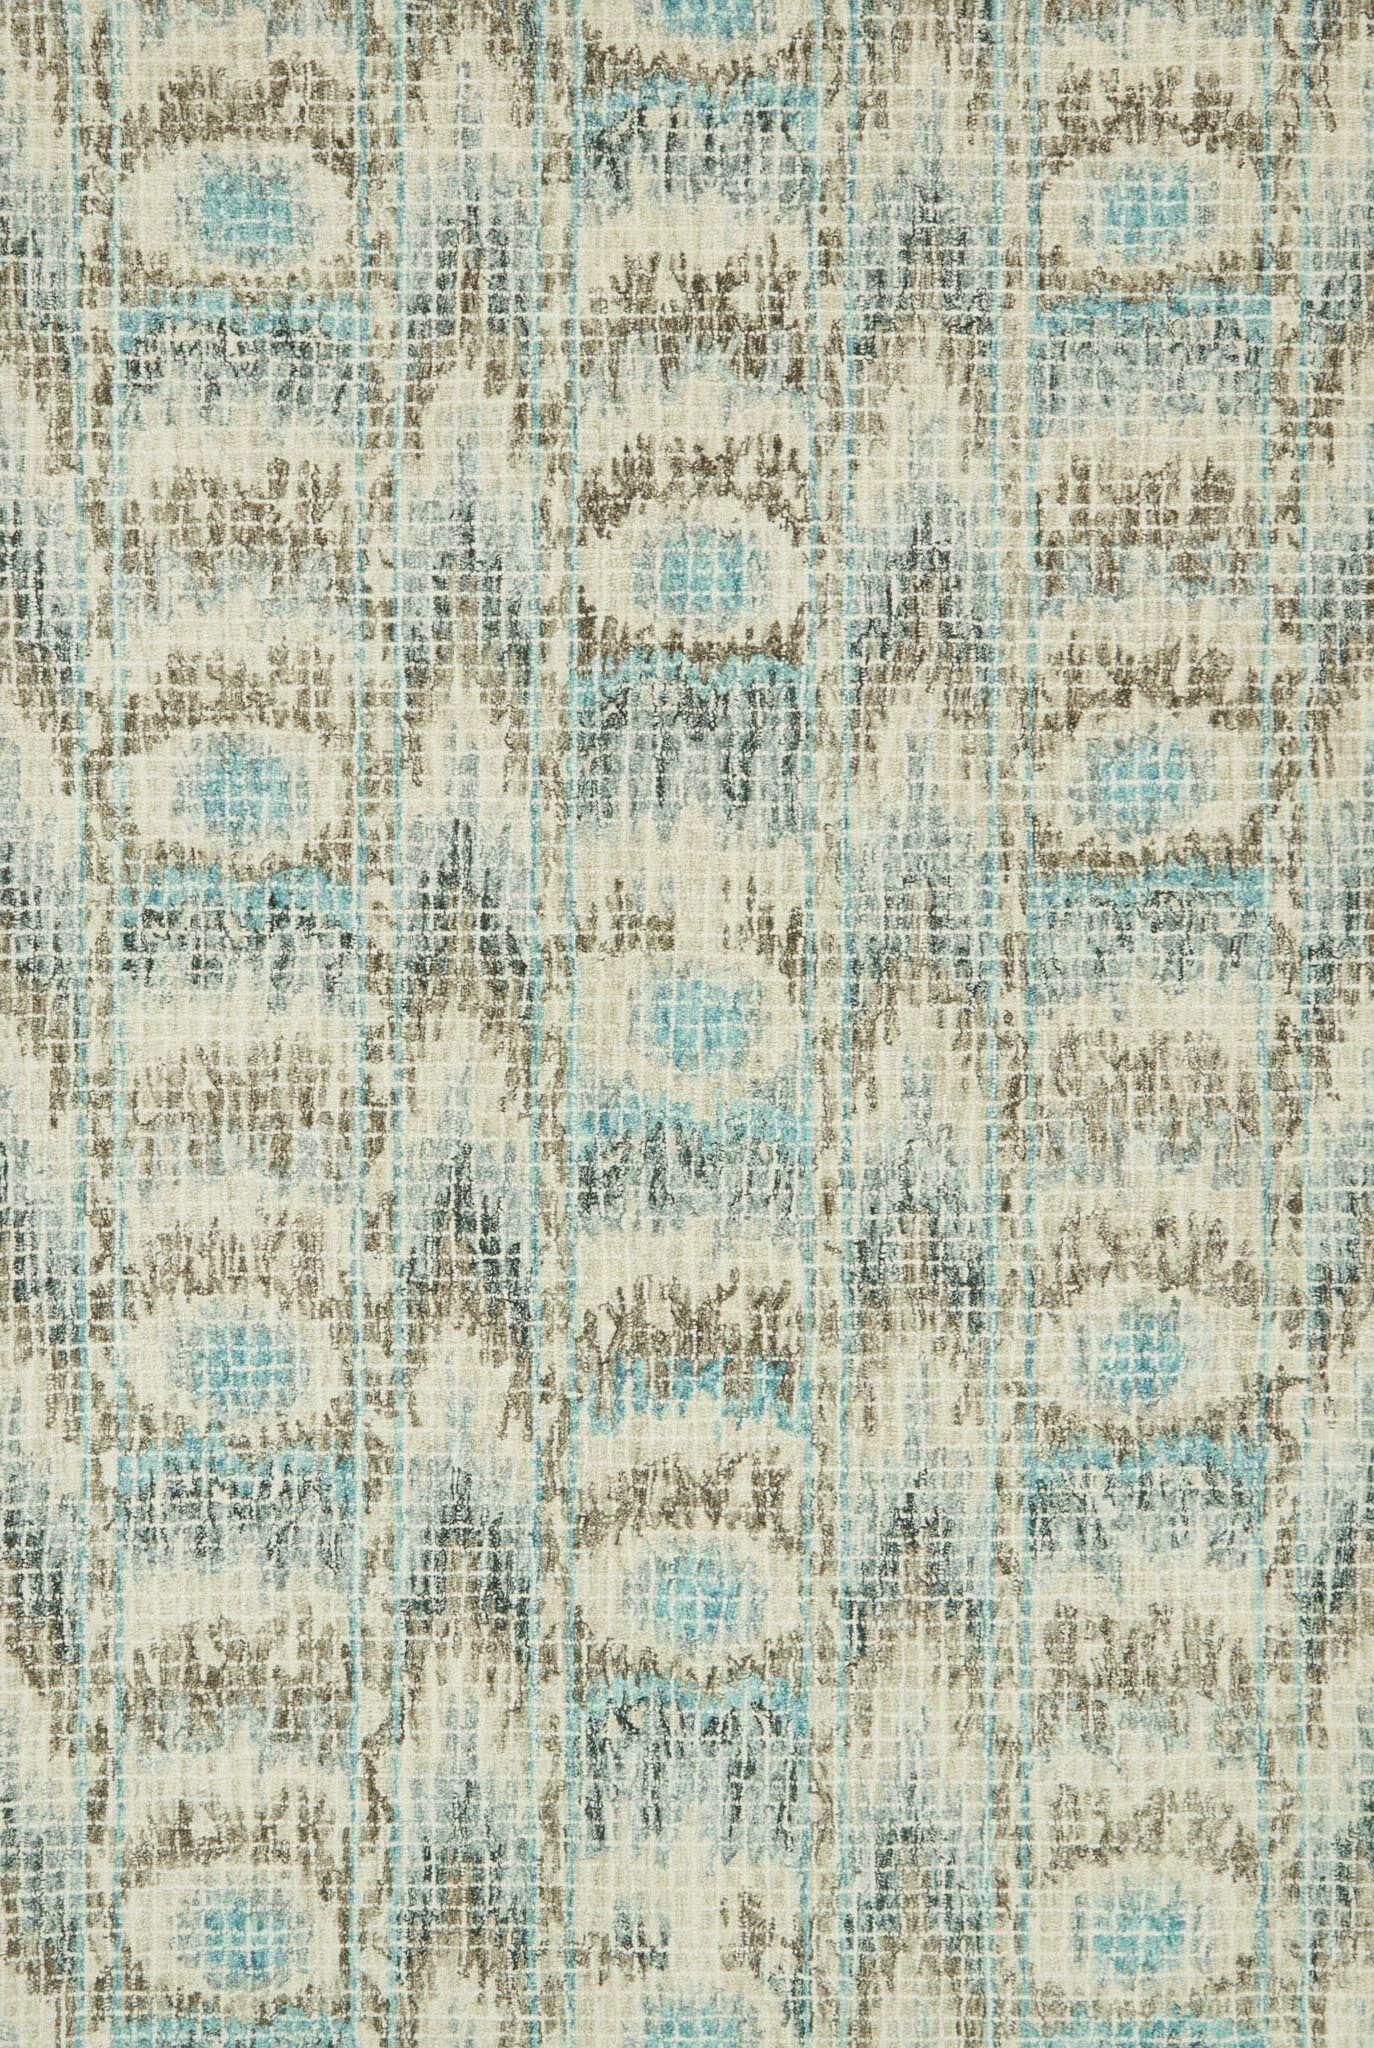 Zeinab Hand Hooked Wool Blue/Turquoise Area Rug Rug Size: Rectangle 9'3